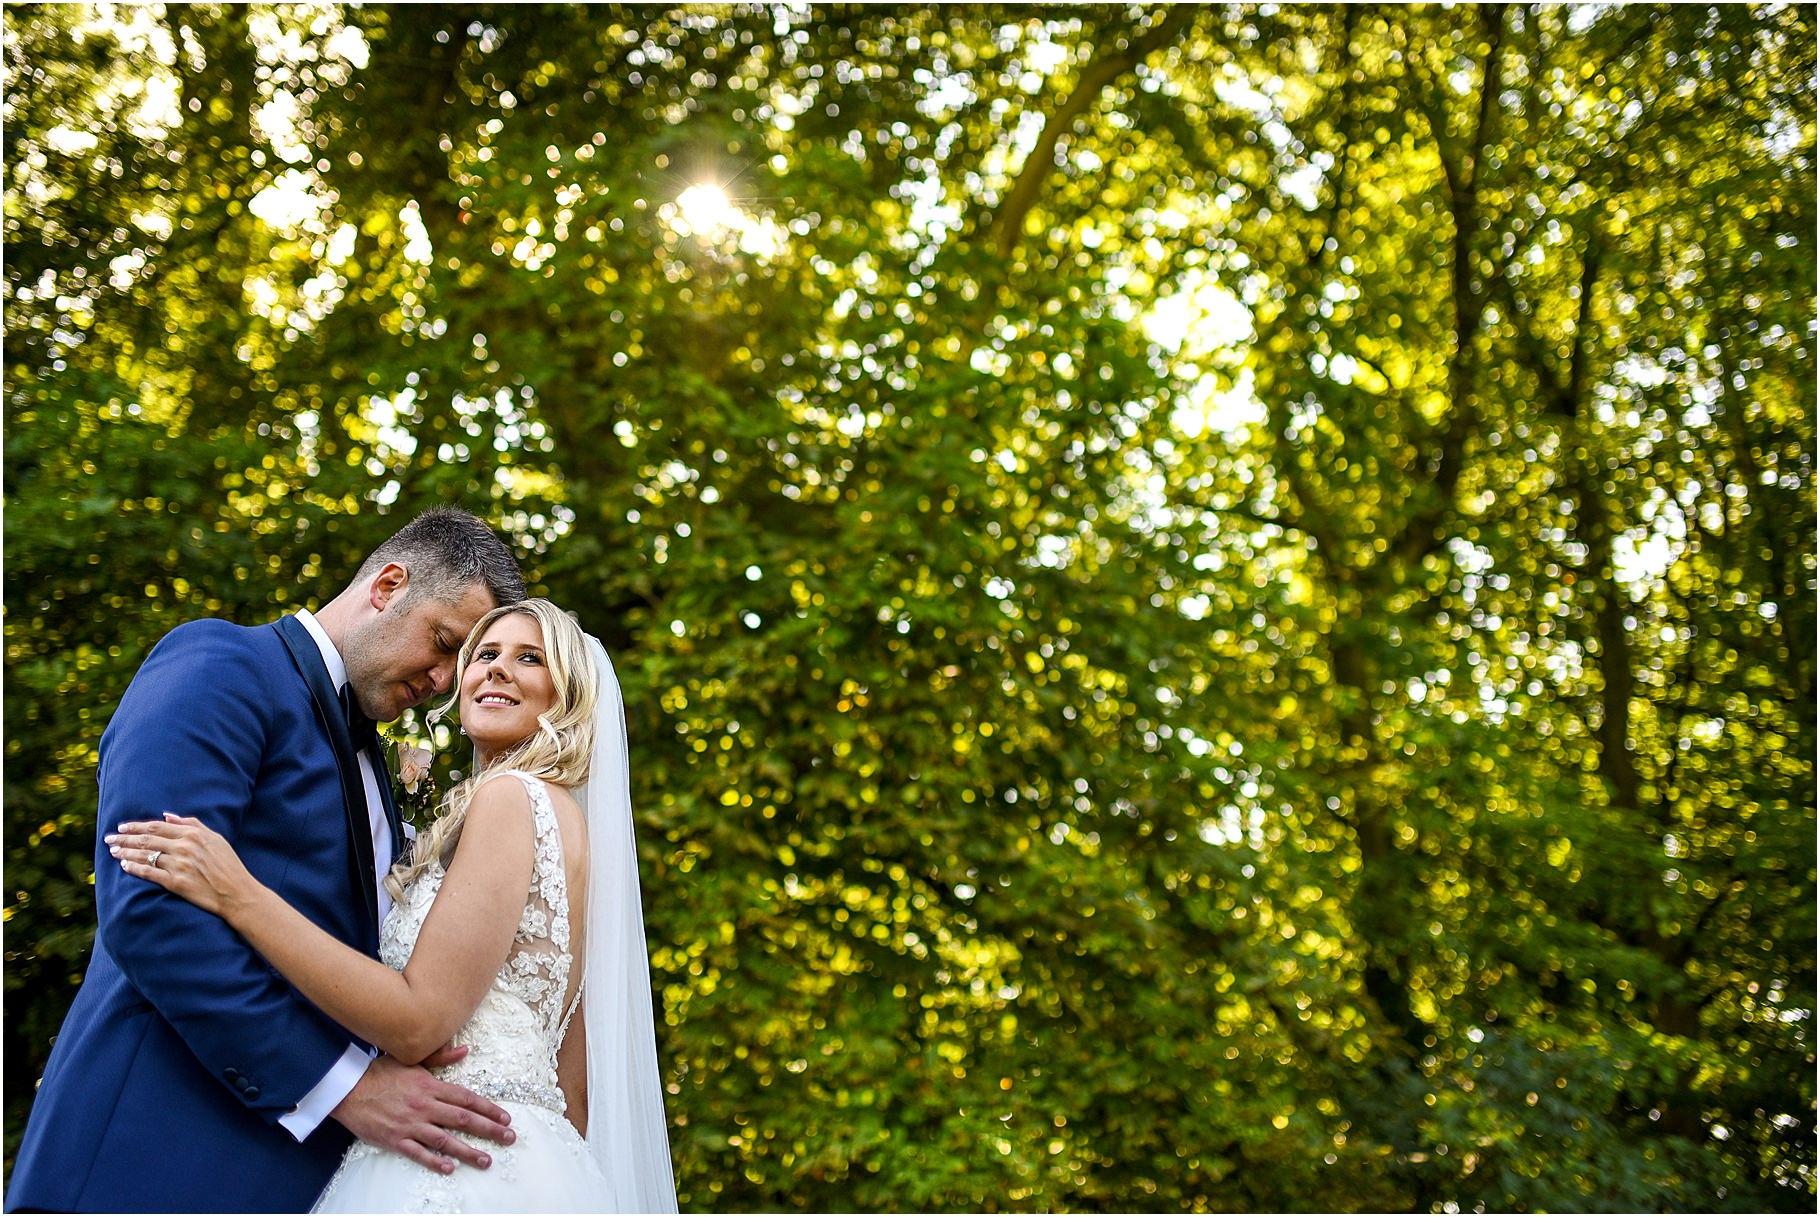 the-villa-wrea-green-wedding-38.jpg